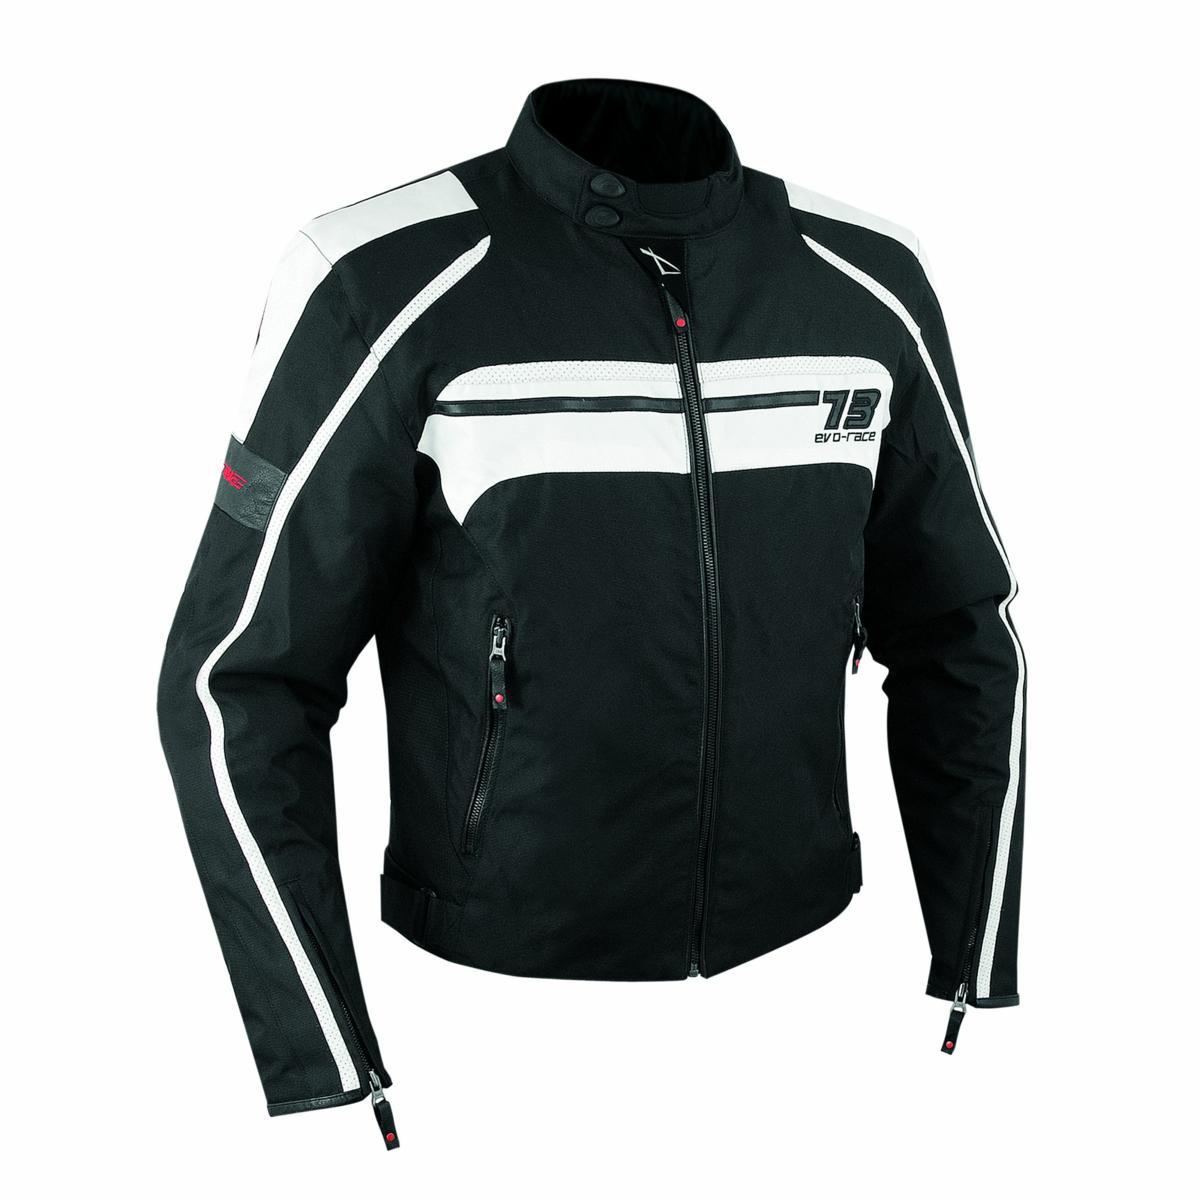 Giacca-Moto-Sport-Custom-Impermeabile-Sfoderabile-Tessuto-Inserti-Pelle-Bianco